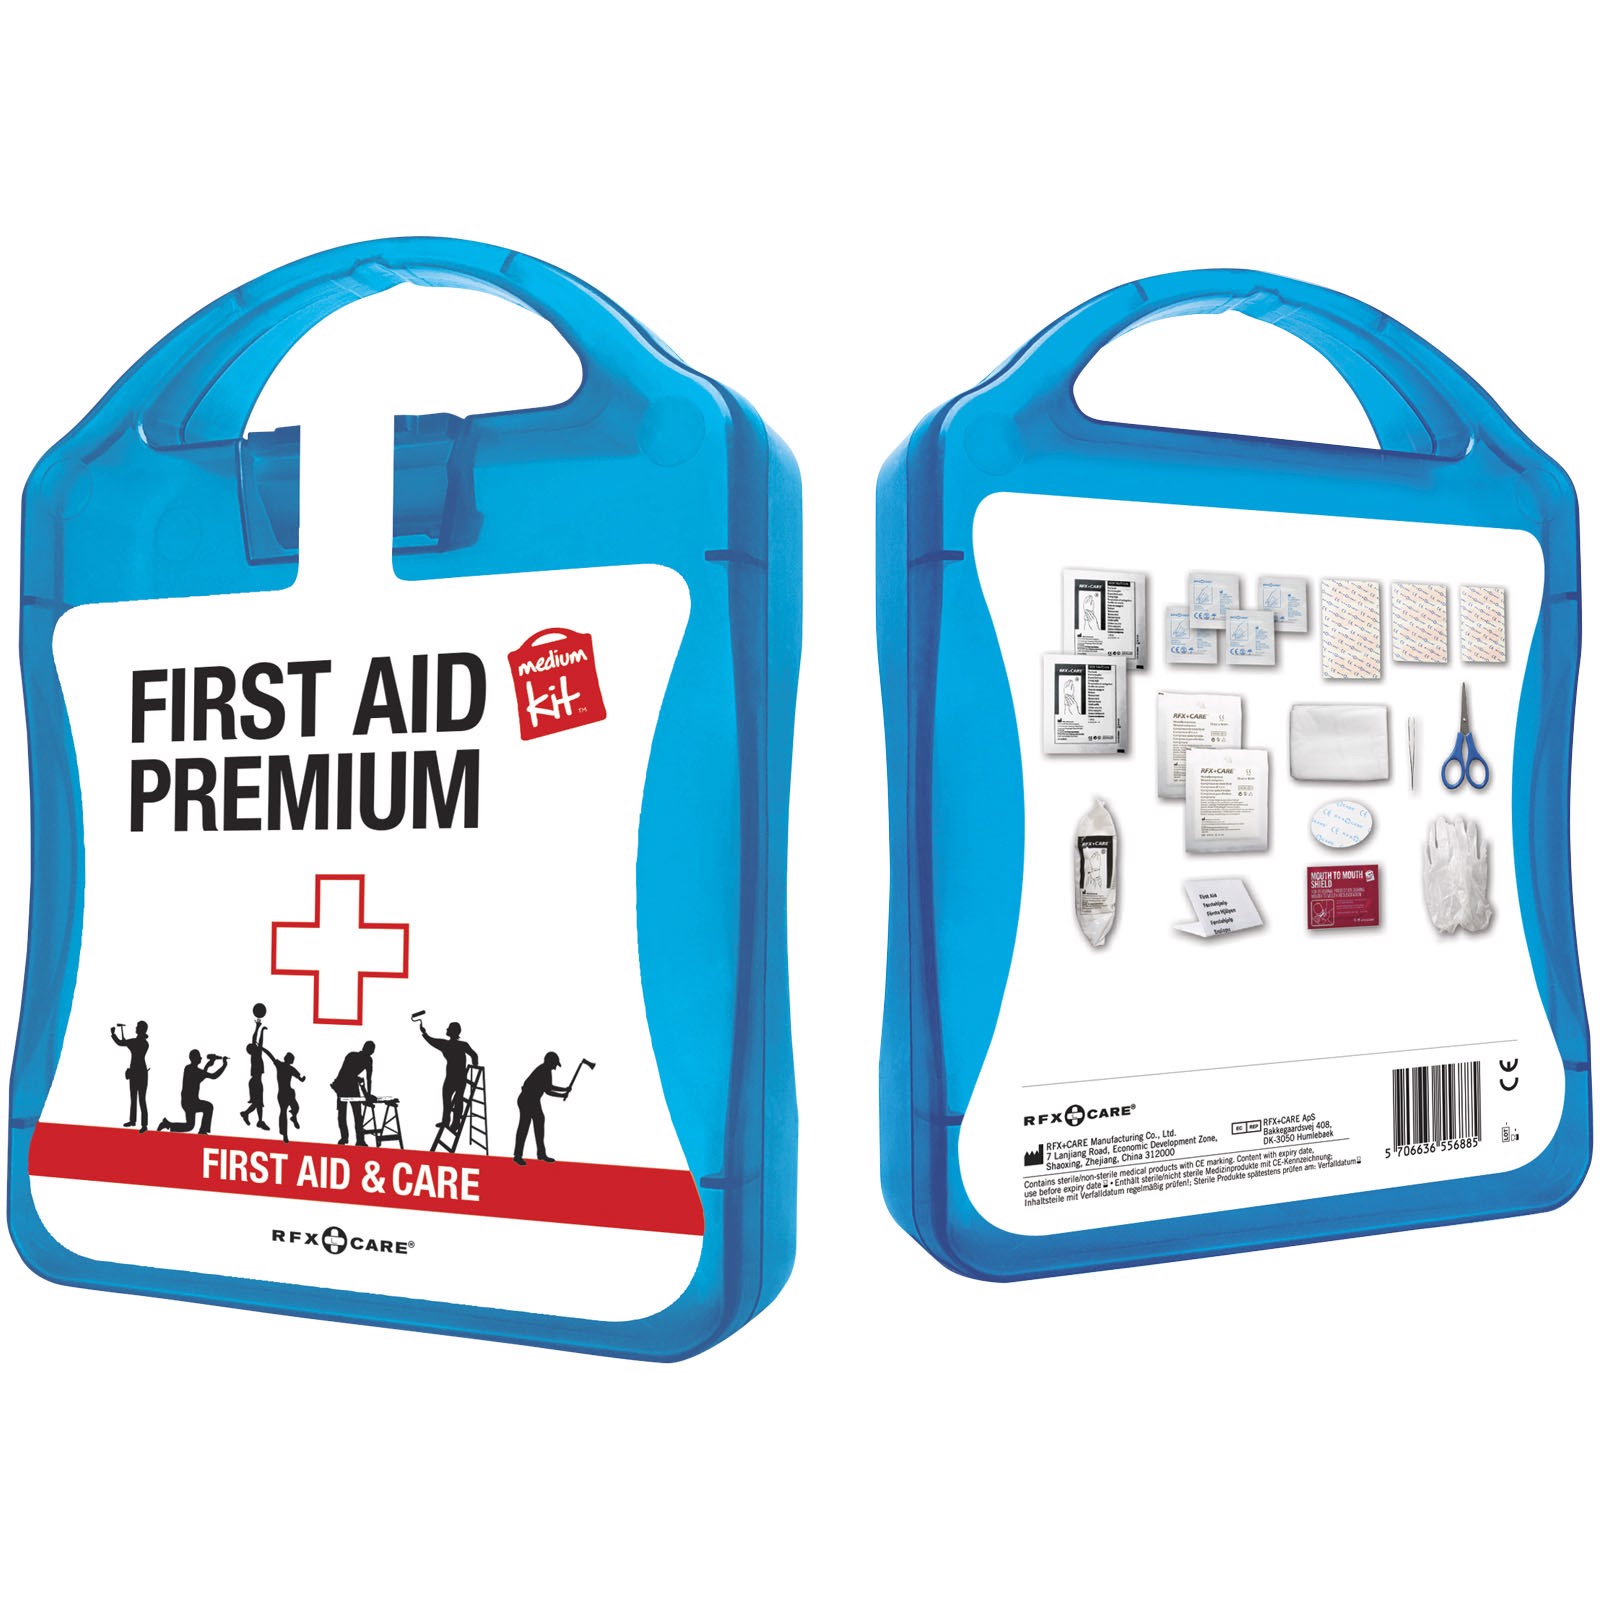 MyKit M First aid kit Premium - Blue